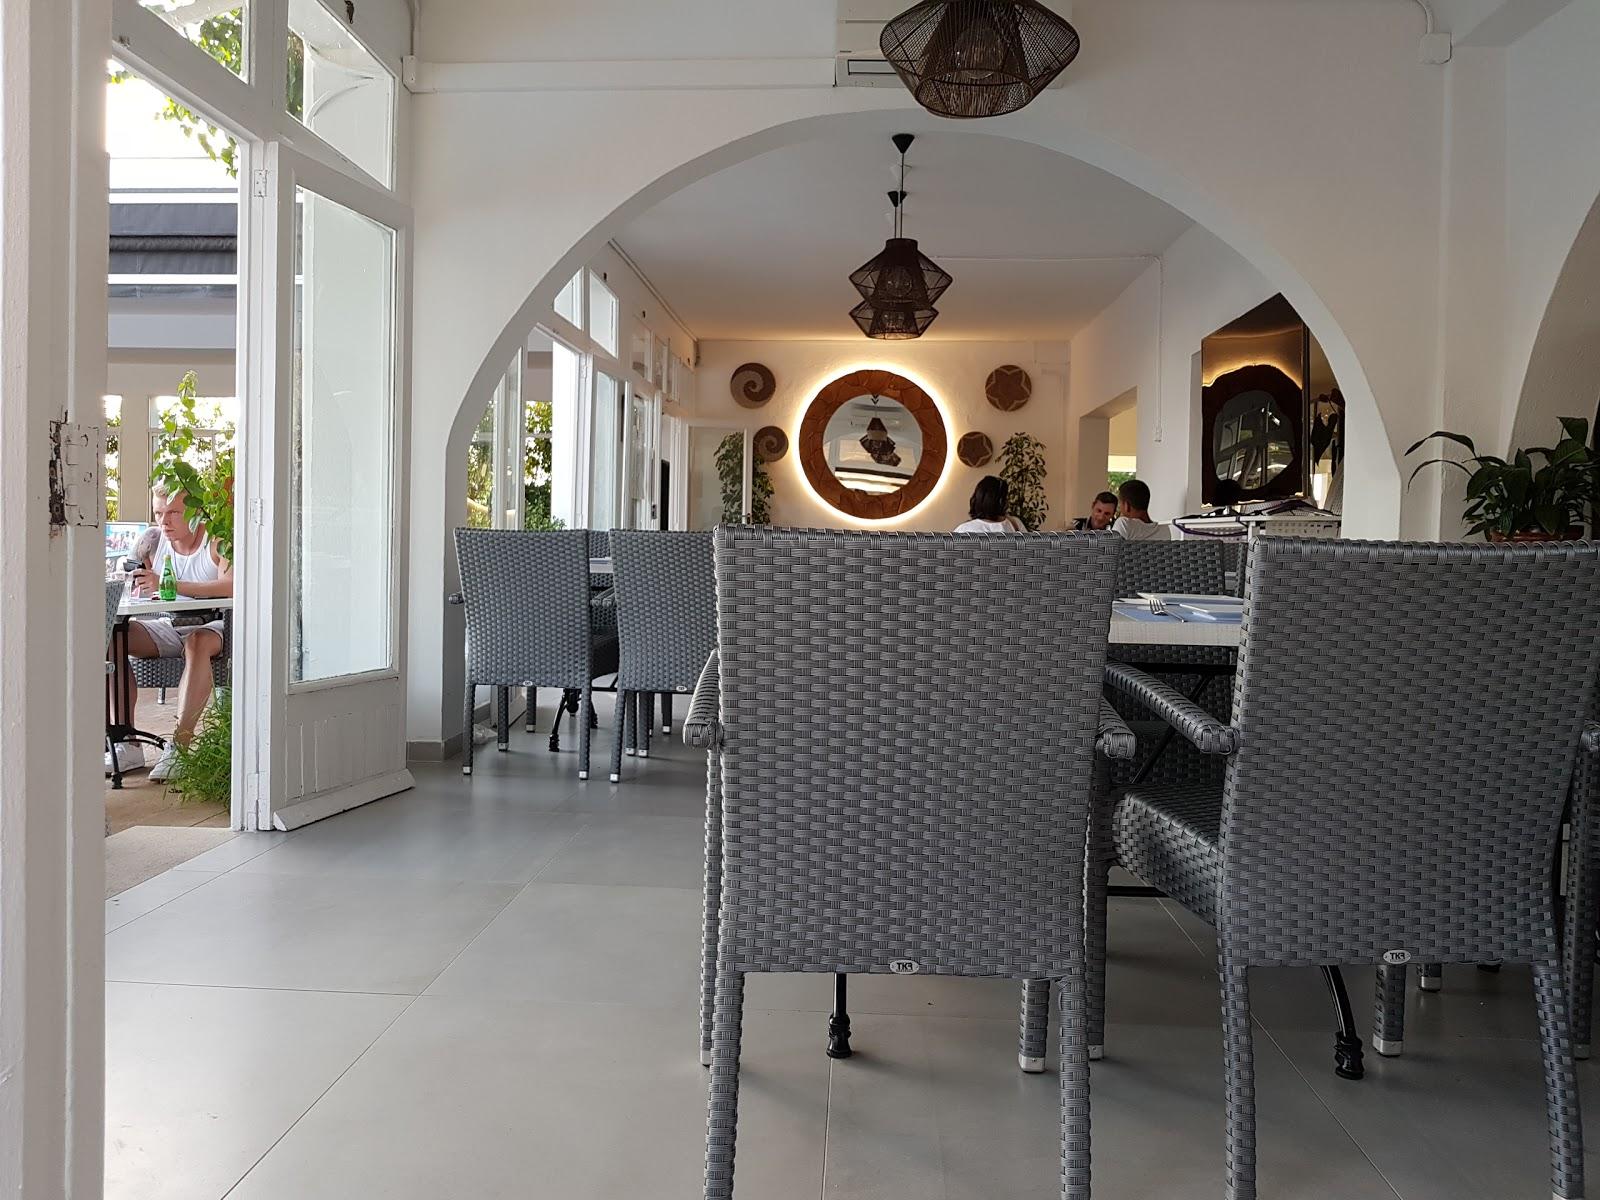 Restaurante Cala Blava